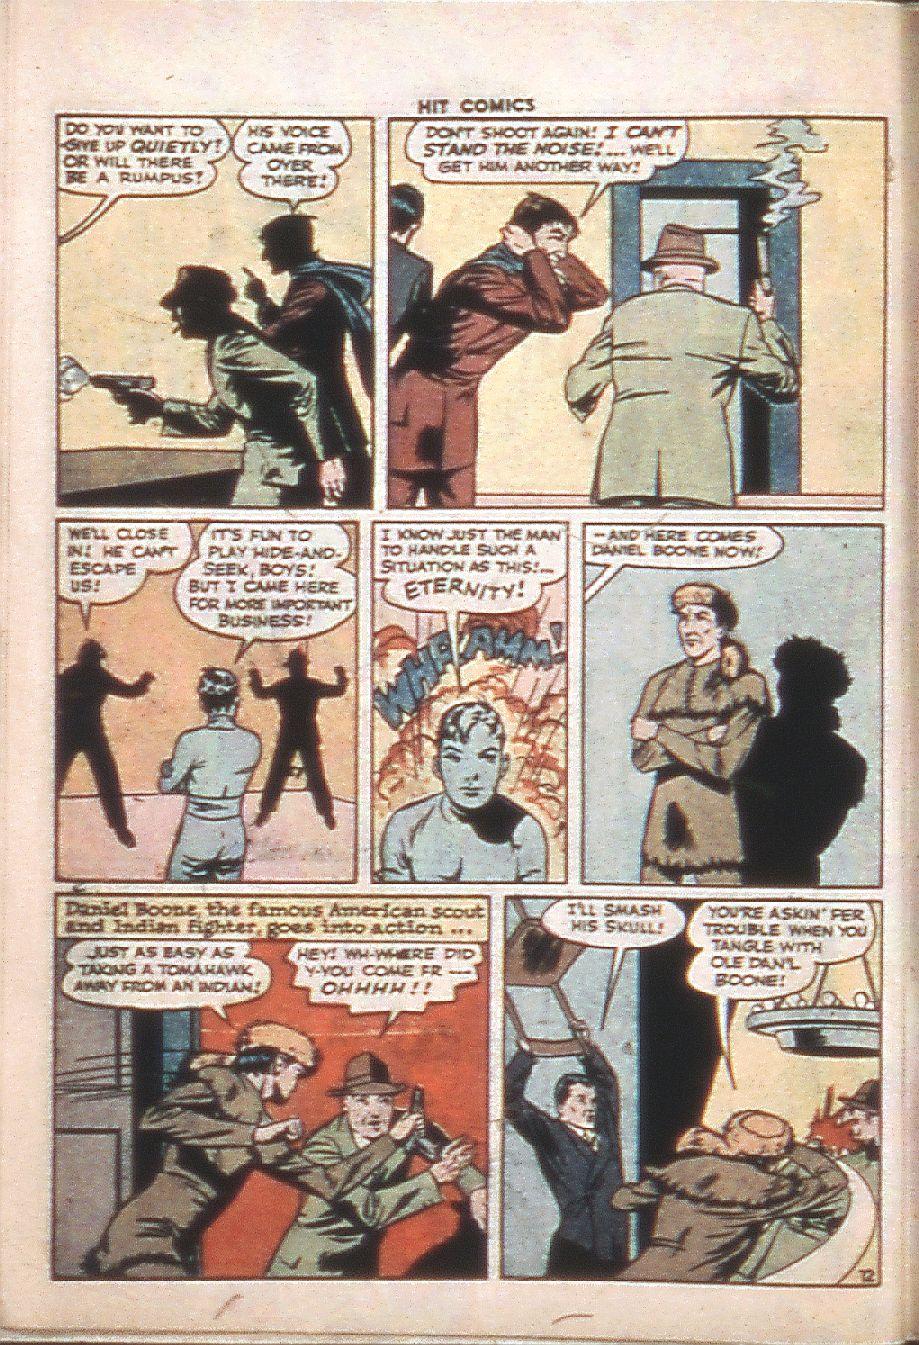 Read online Hit Comics comic -  Issue #37 - 14